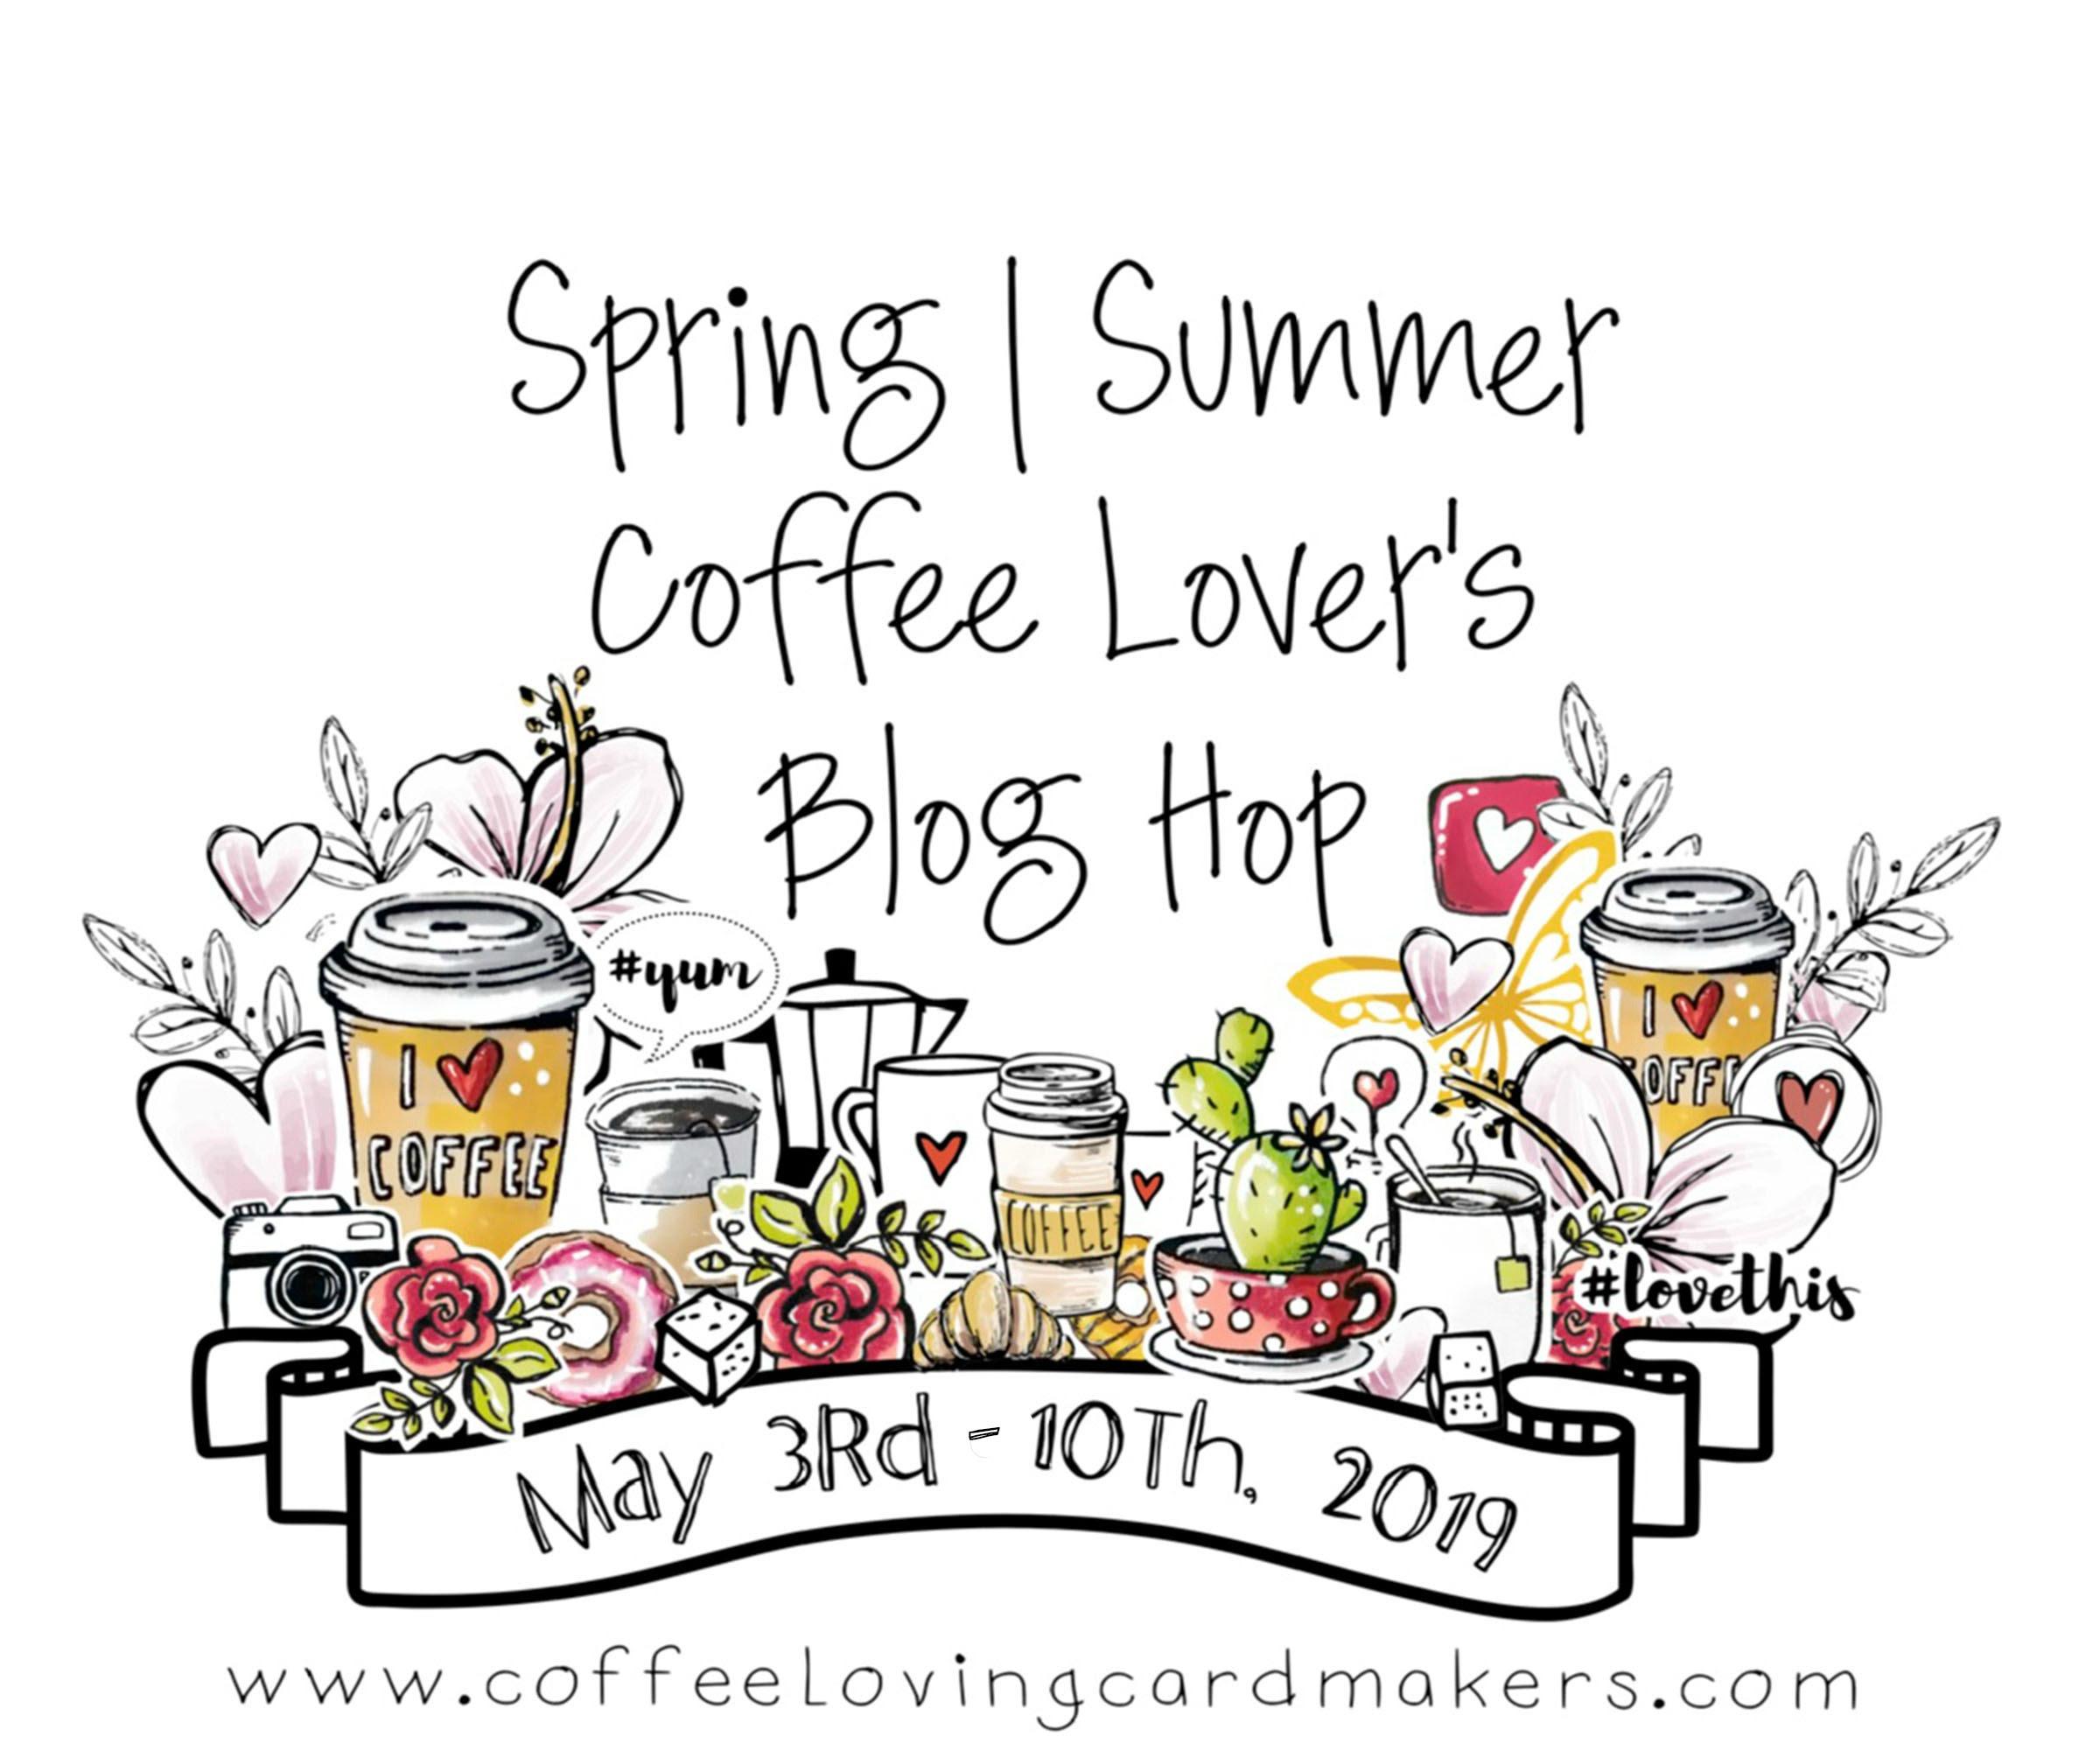 Spring Summer Coffe lovers blog hop